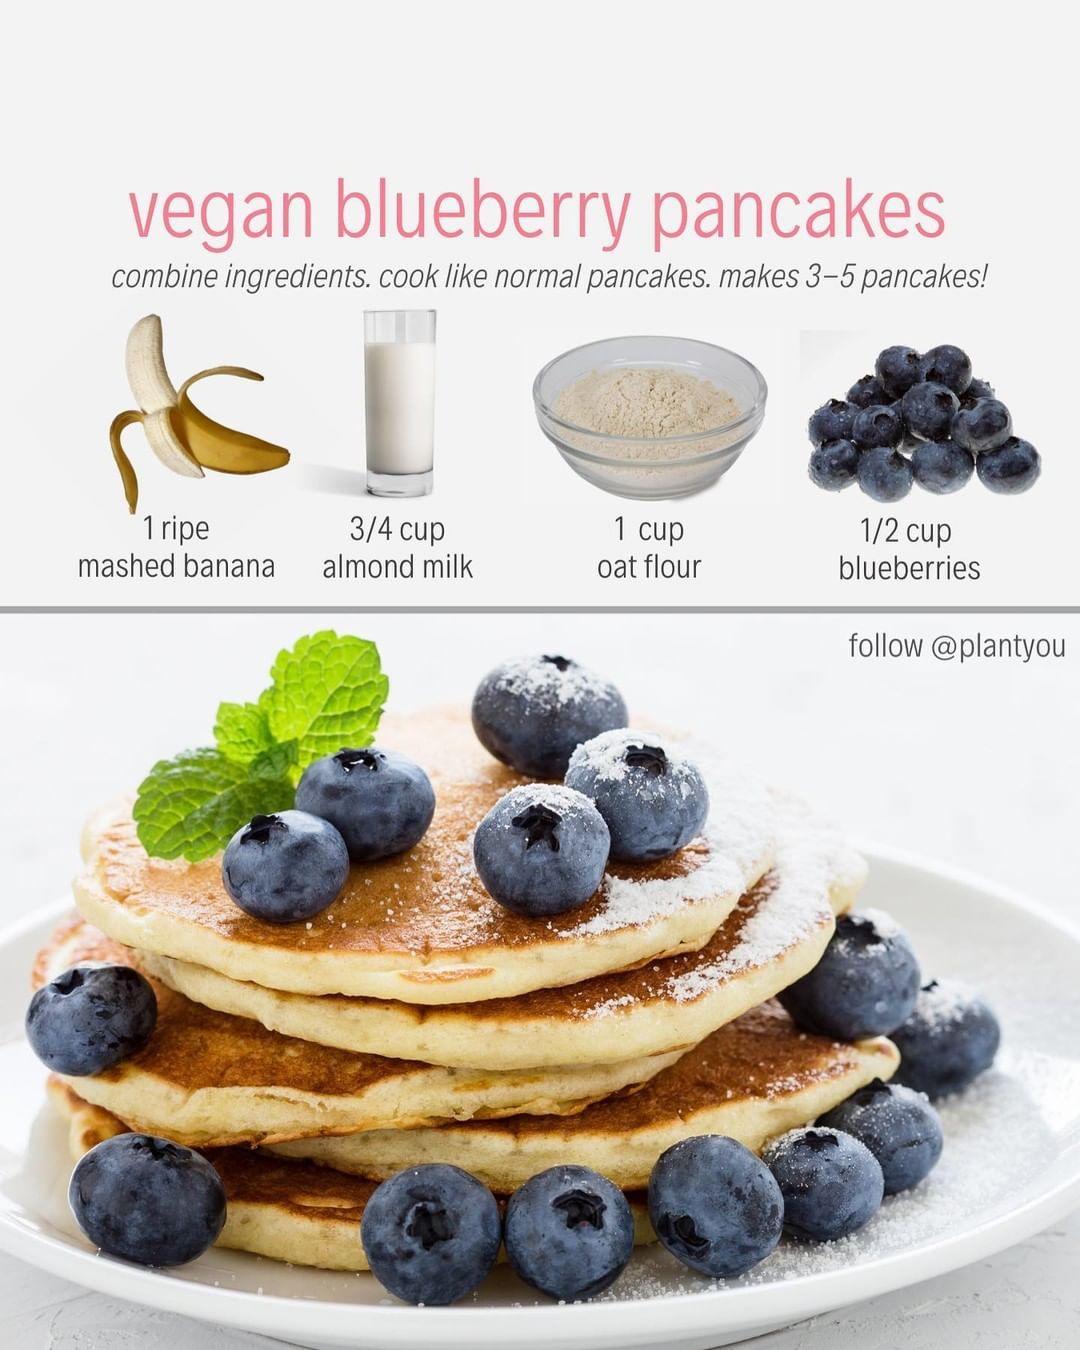 Vegan Fitness Nutrition Info On Instagram Follow Plantyou Blueberry Pancakes A Healthier Twist O Vegan Recipes Plant Based Plant Based Pancakes Food